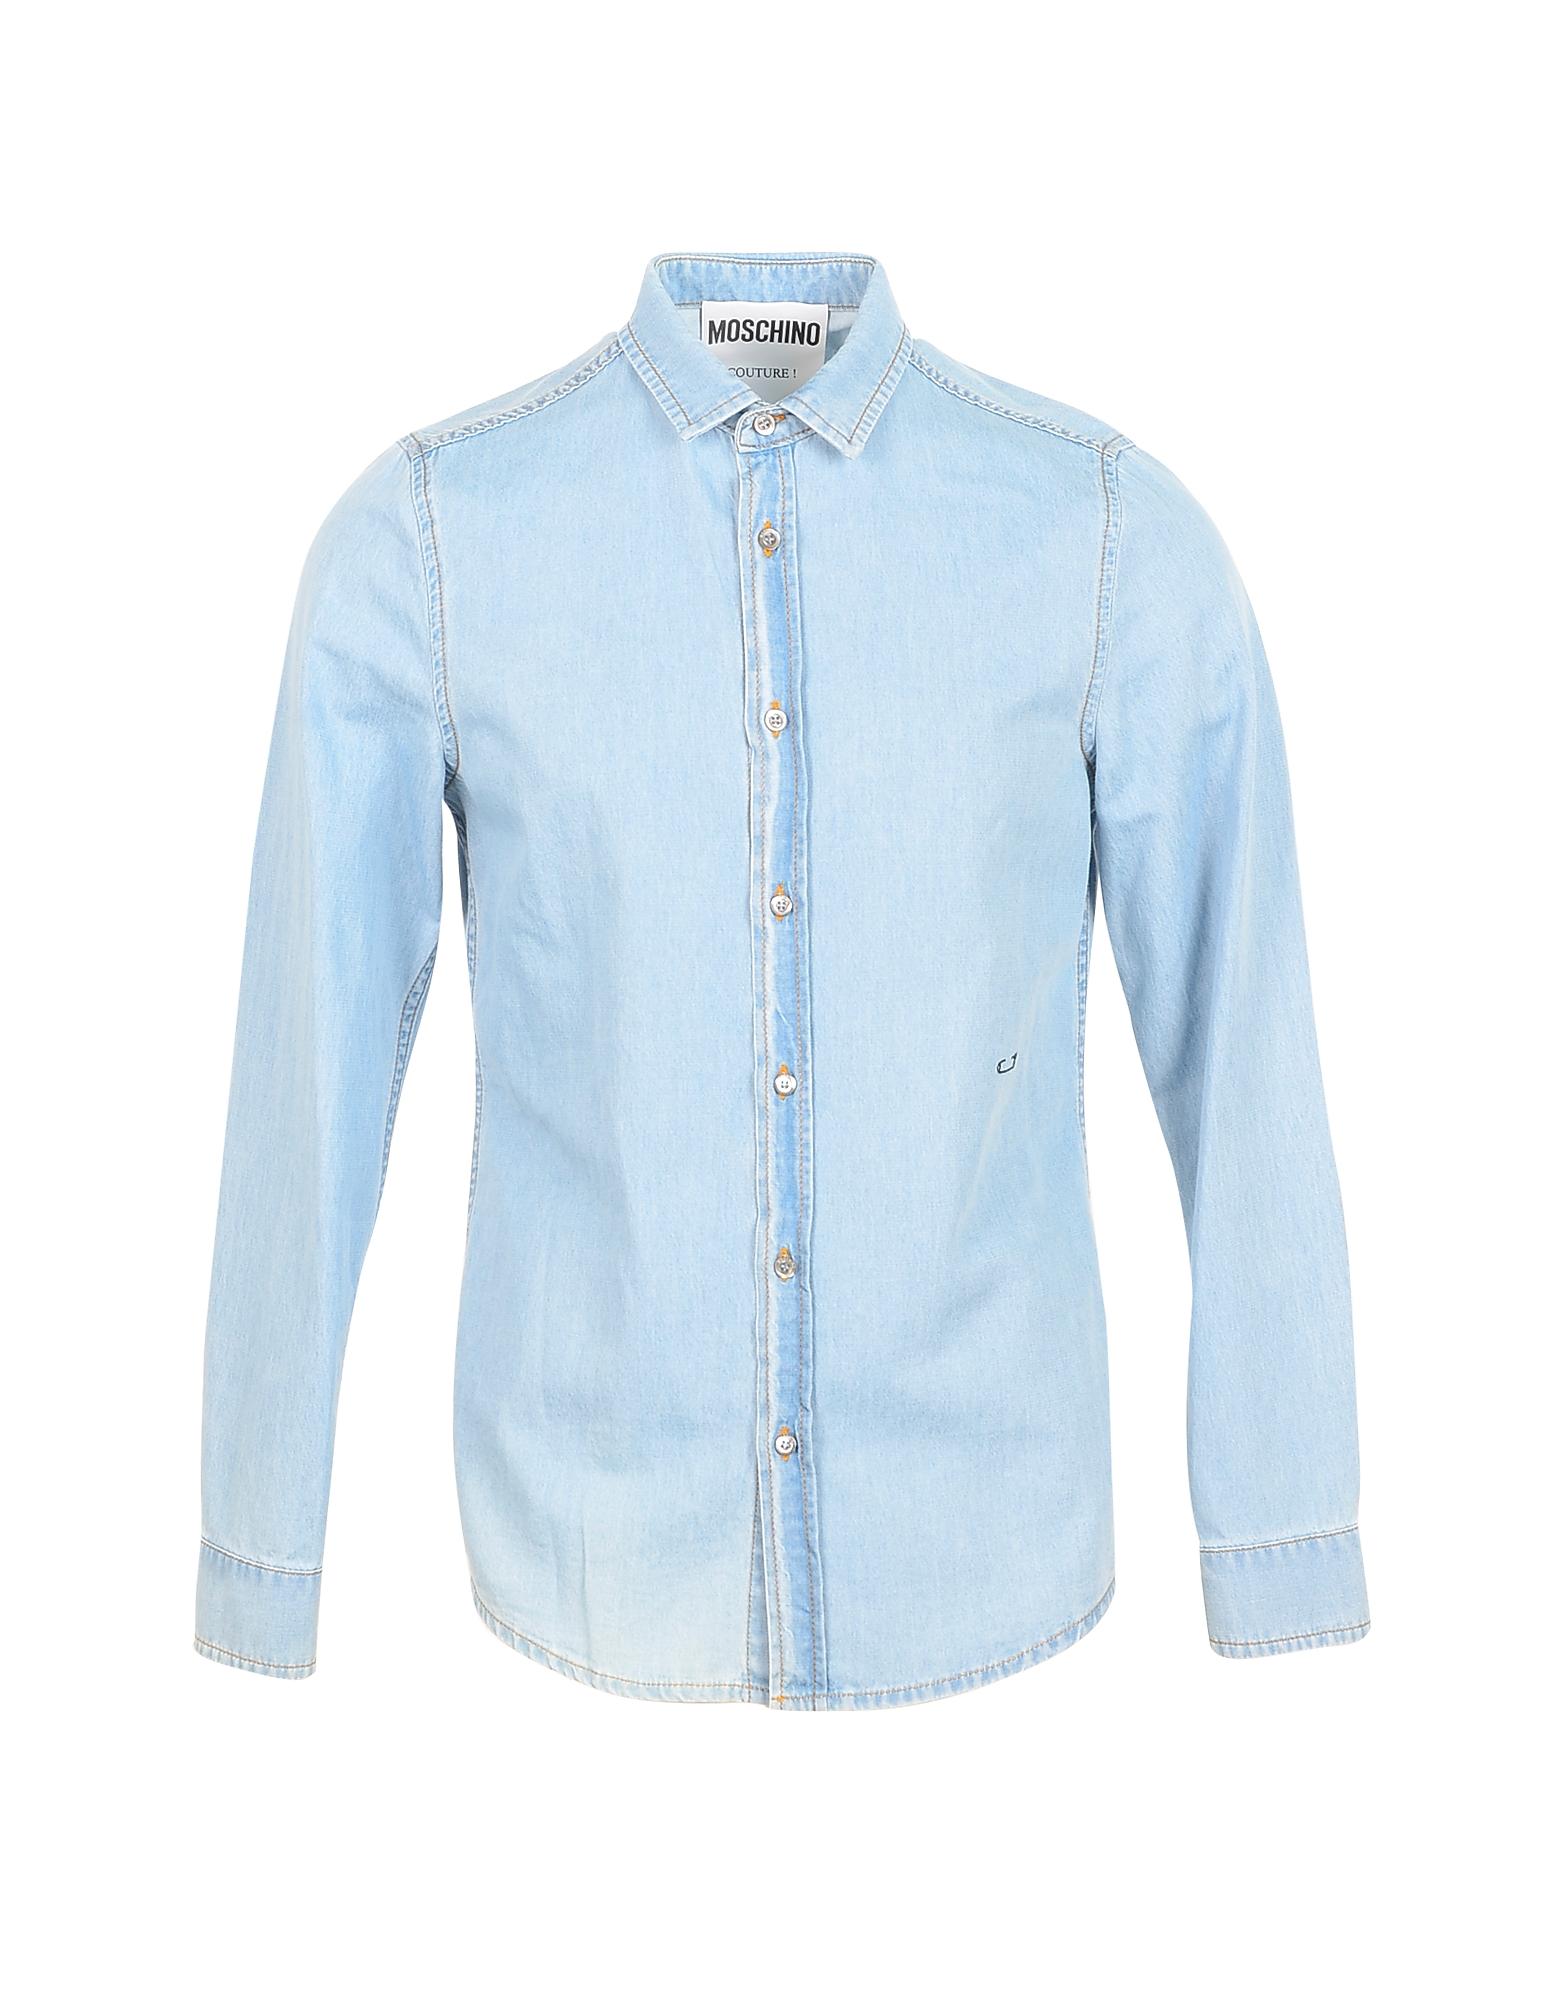 Moschino Designer Shirts, Blue Denim Men's Shirt w/Signature Embroidery